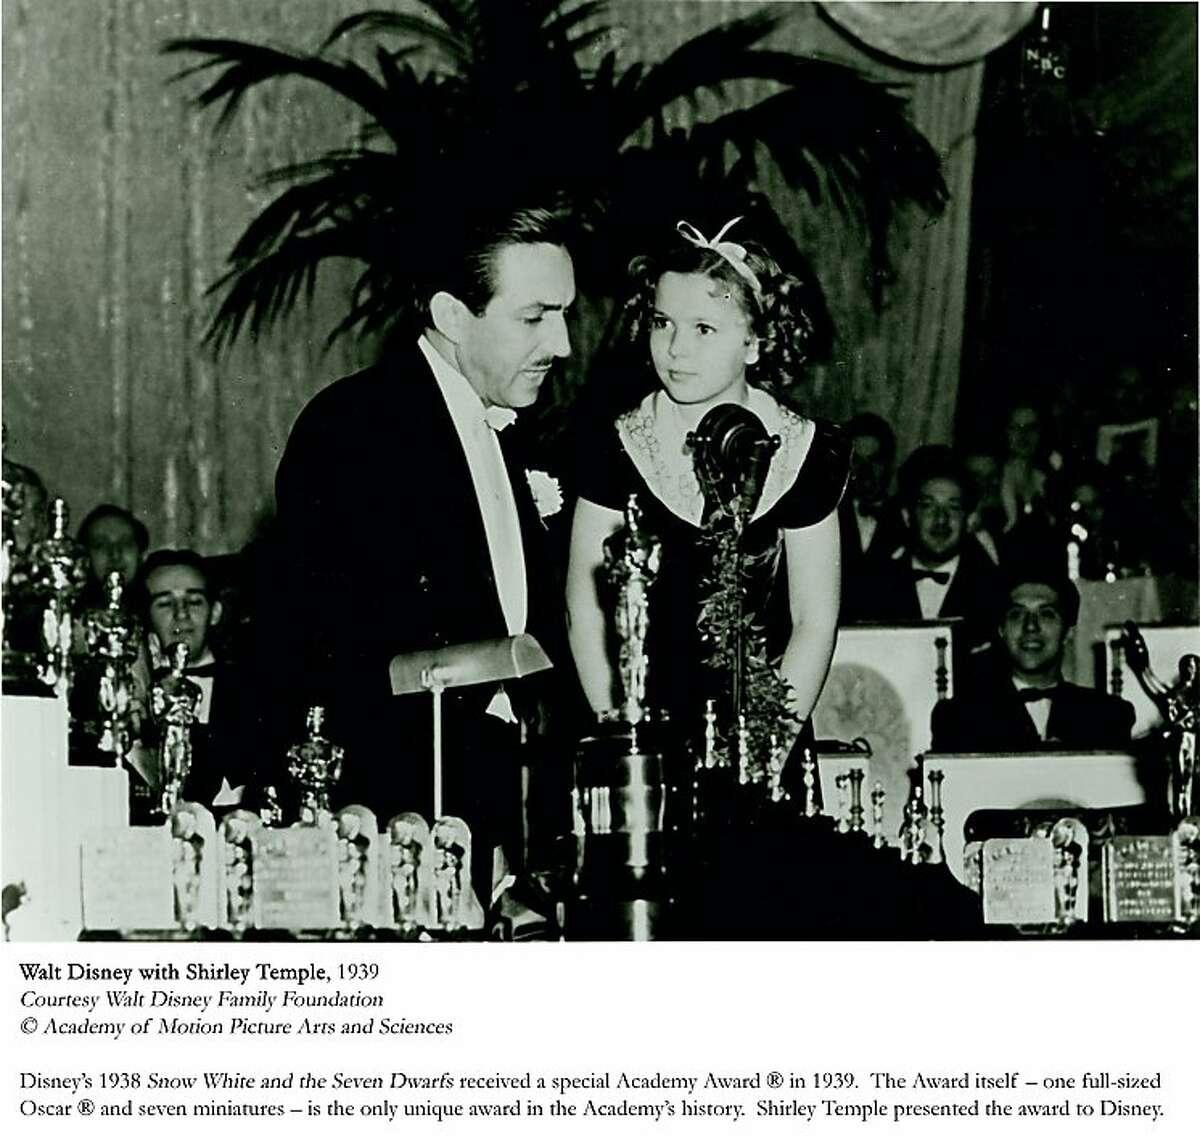 Walt Disney with Shirley Temple. Walt Disney Family Museum